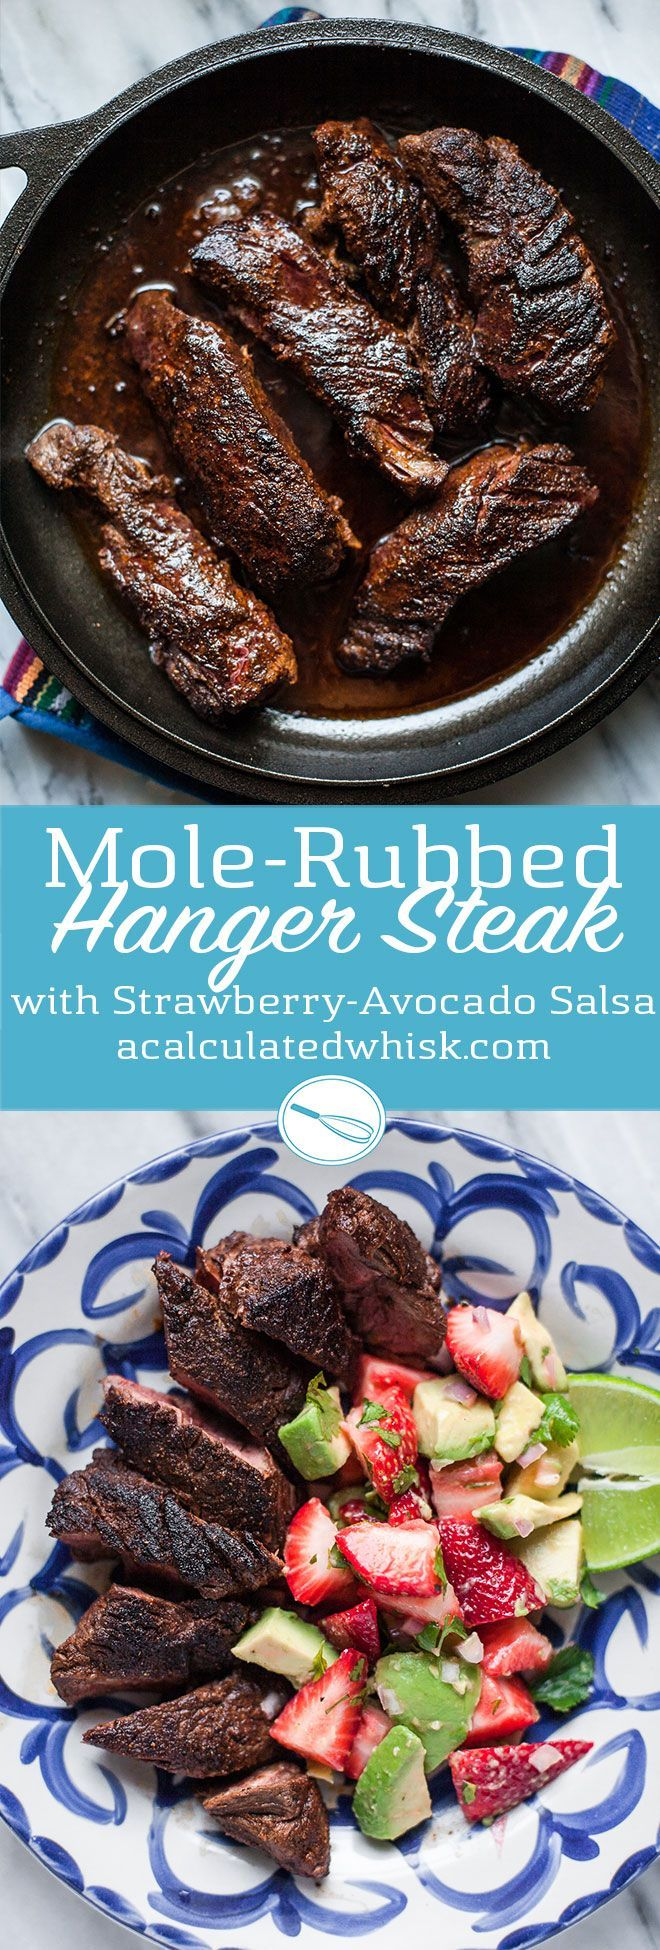 Air Fryer Italian Ribeye Steak Recipe in 2020 | Hanger ...